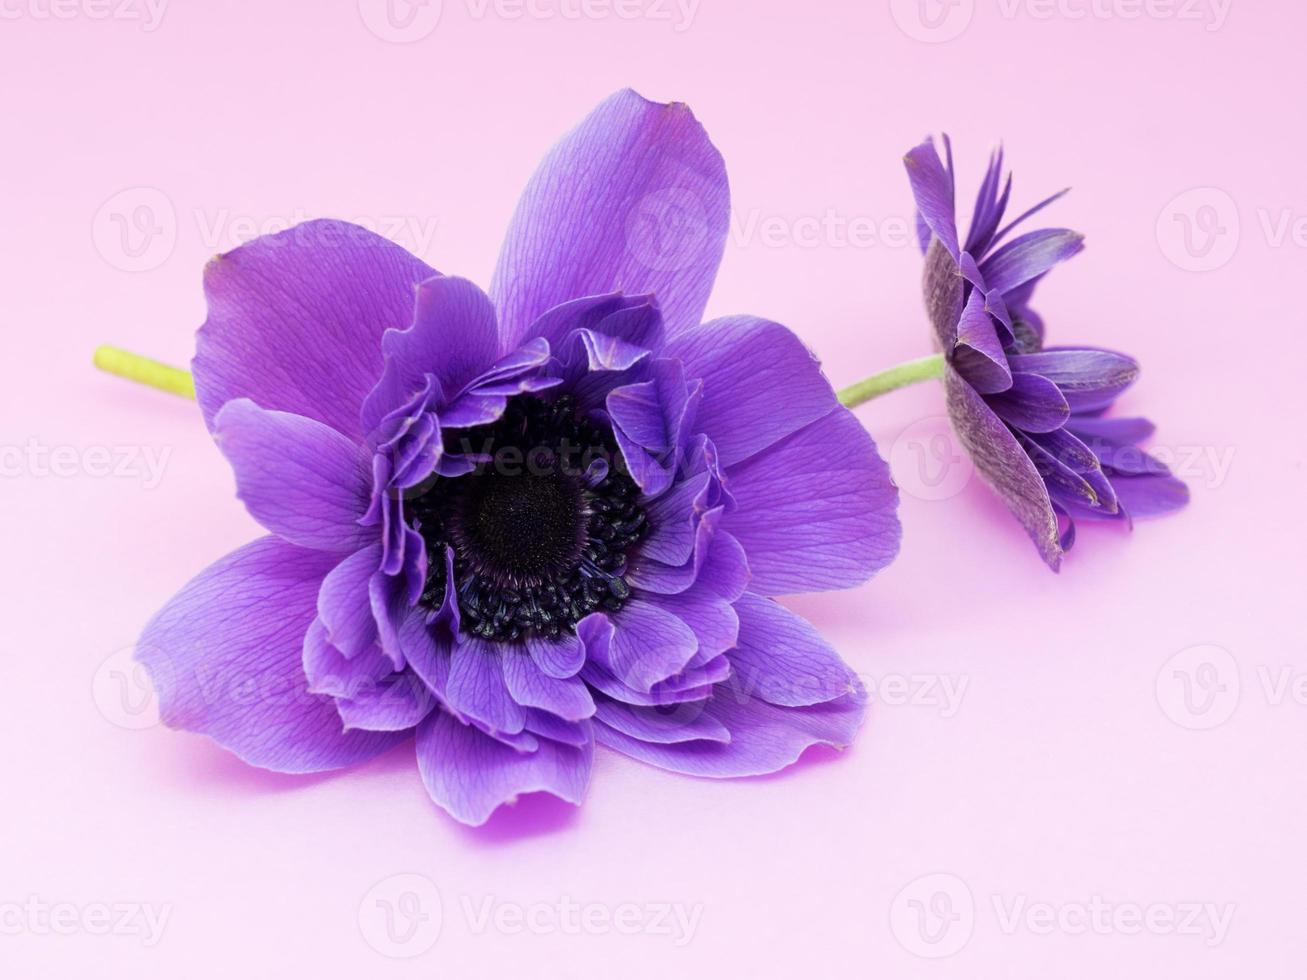 bellissimo anemone viola foto